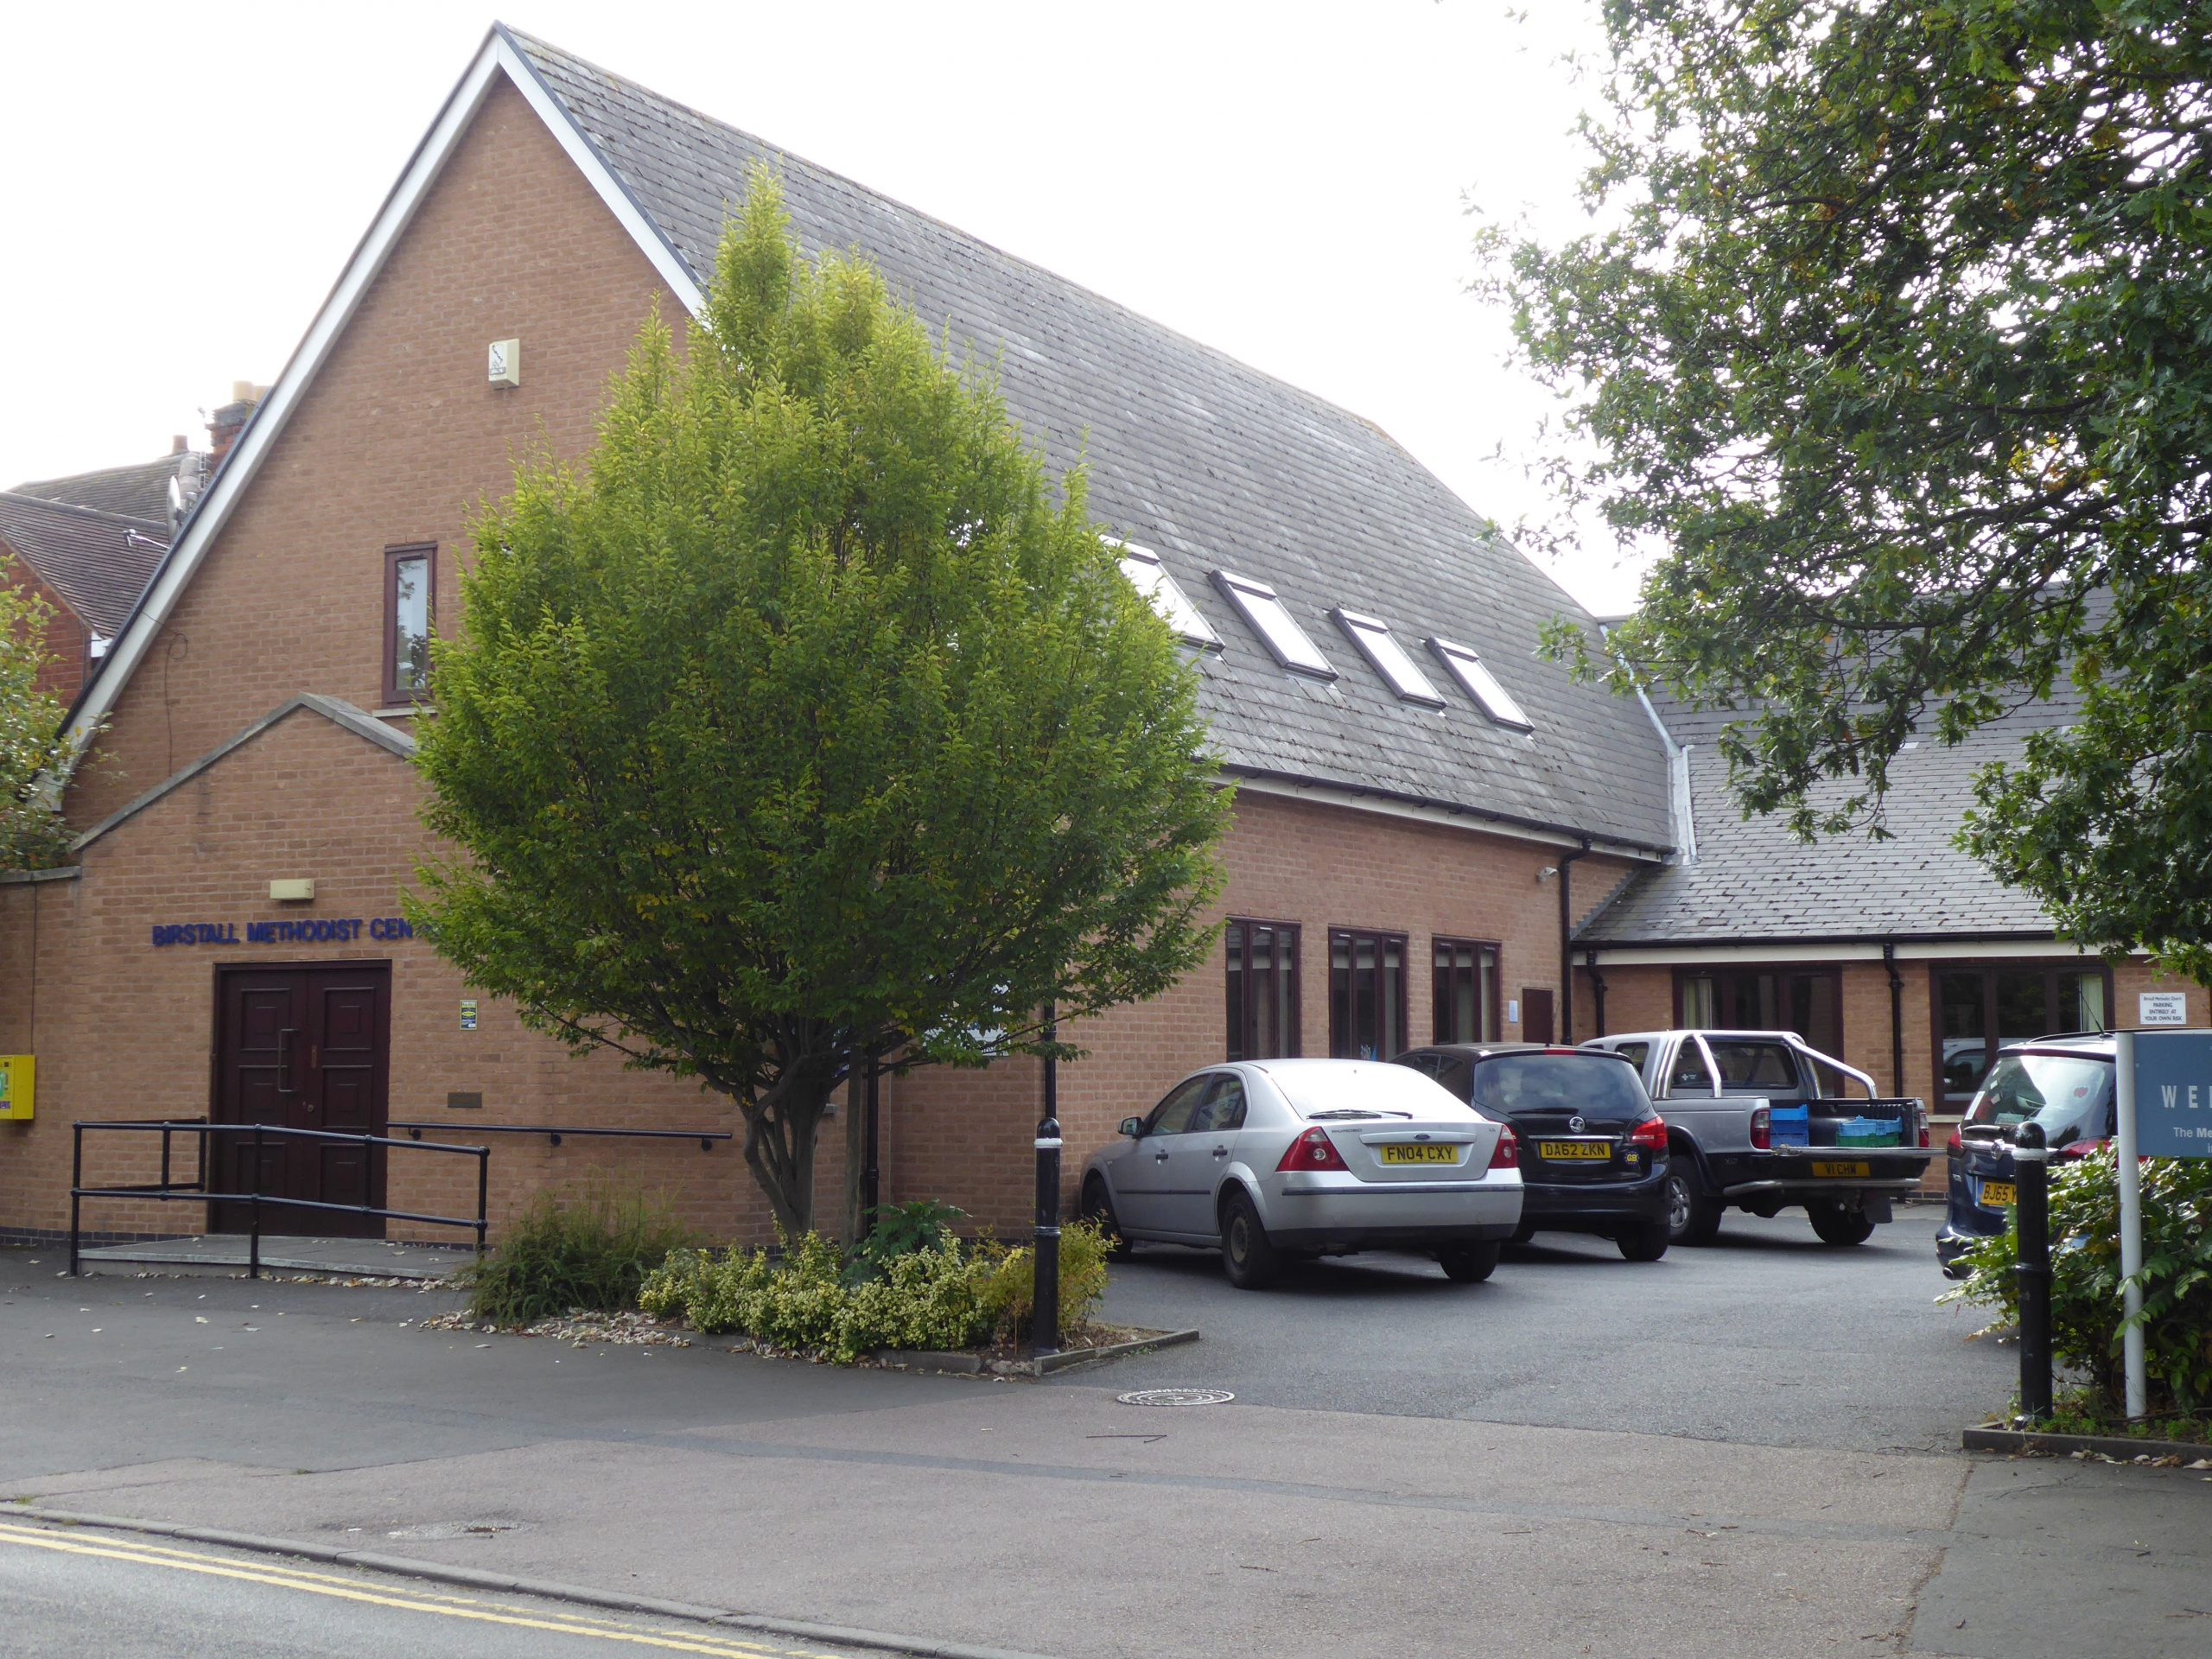 Birstall Methodist Centre. Wanlip Lane Birstall. Leicestershire | Leicestershire | My Methodist History